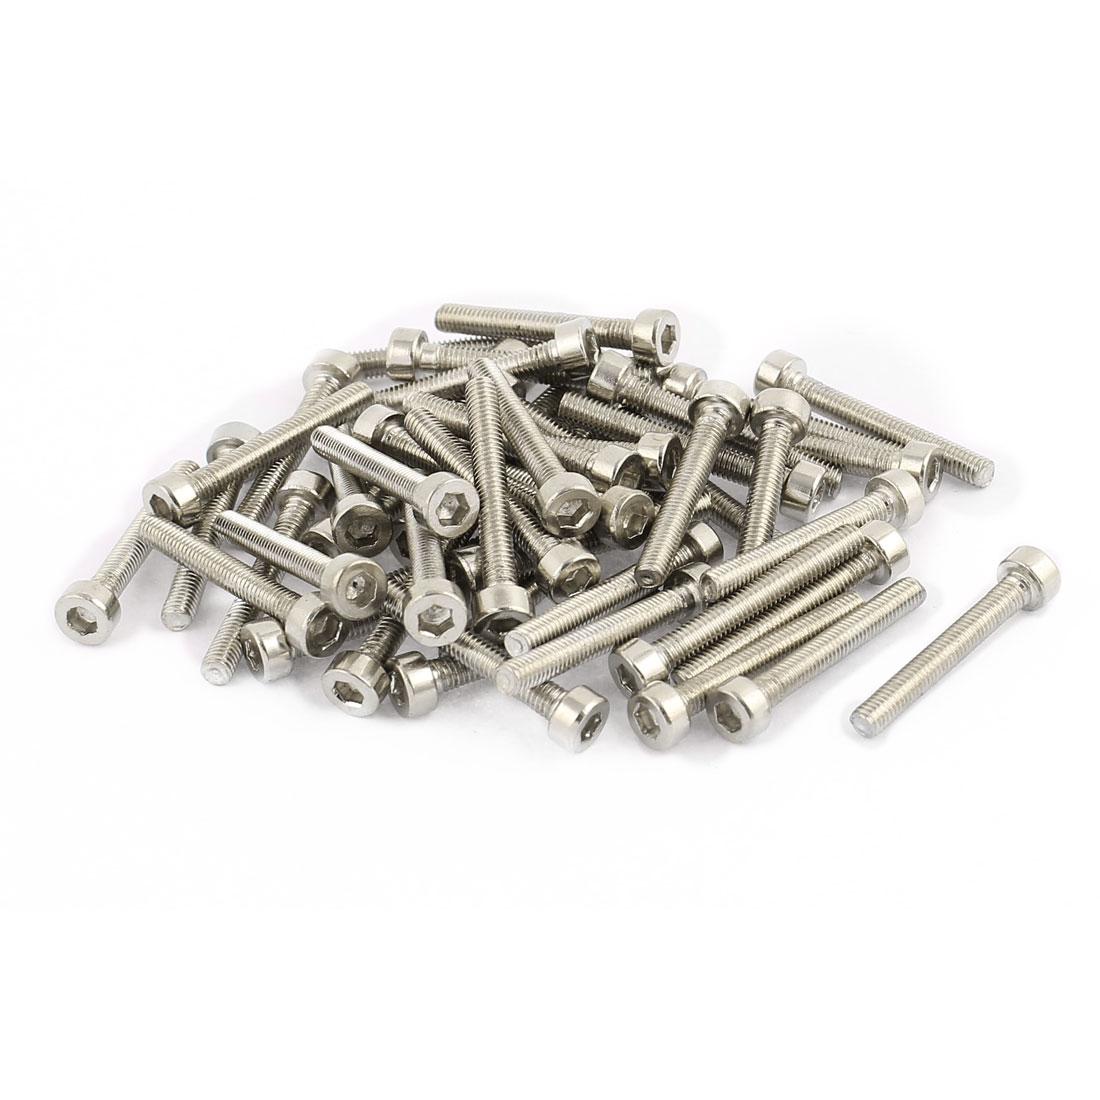 50Pcs Silver Tone M3 x 22mm Stainless Steel Hex Bolt Socket Head Cap Machine Screws